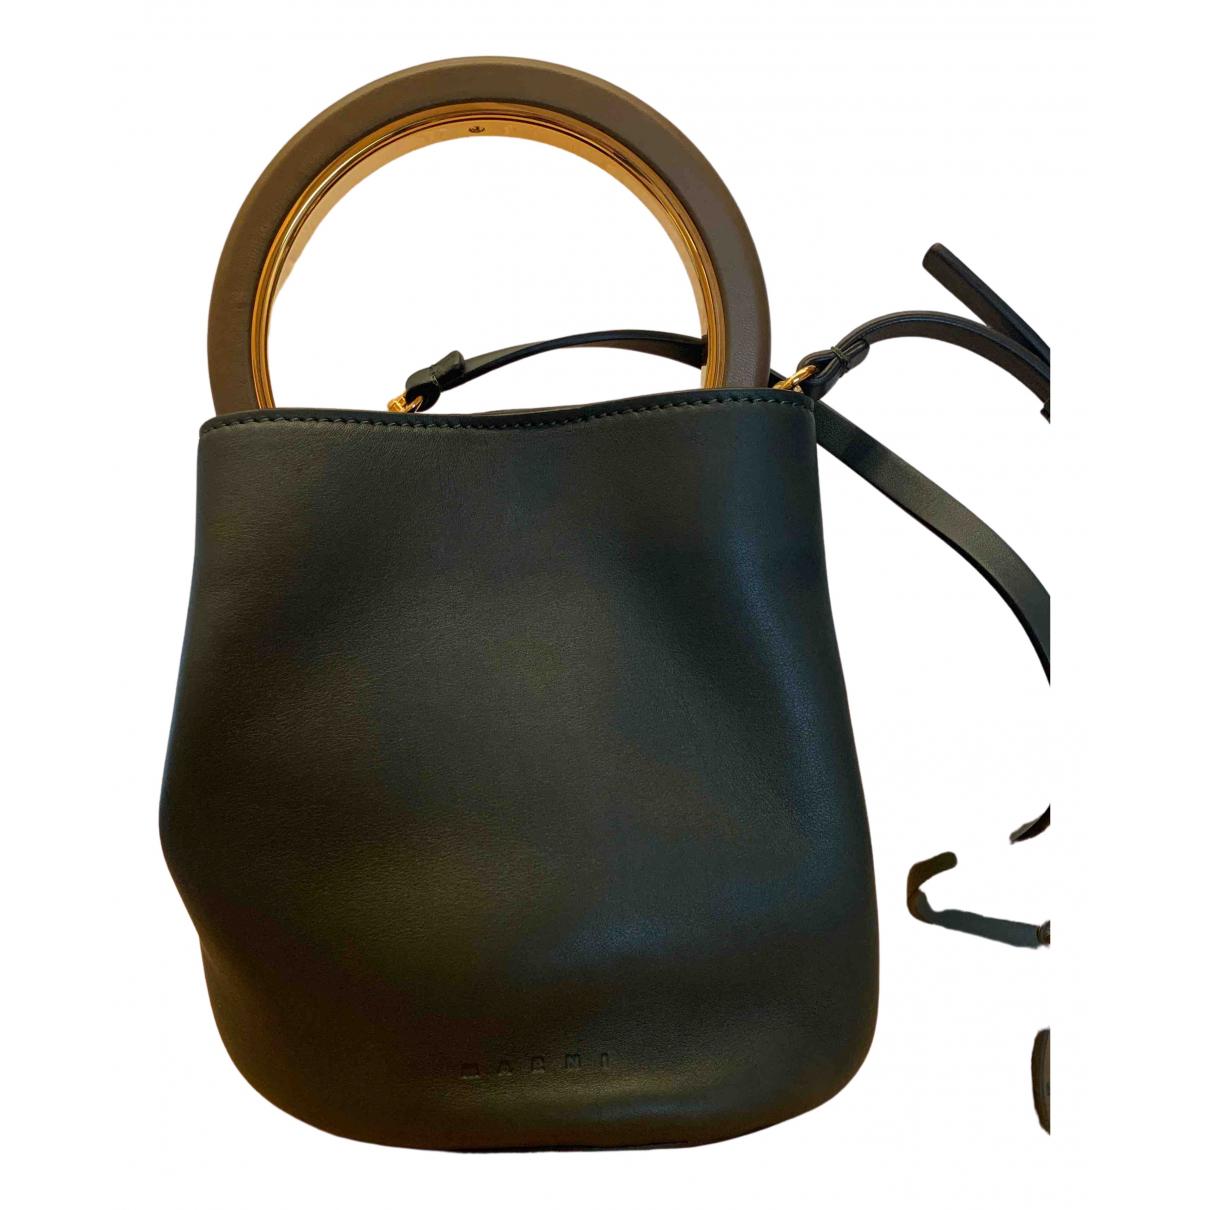 Marni Pannier Green Leather handbag for Women N